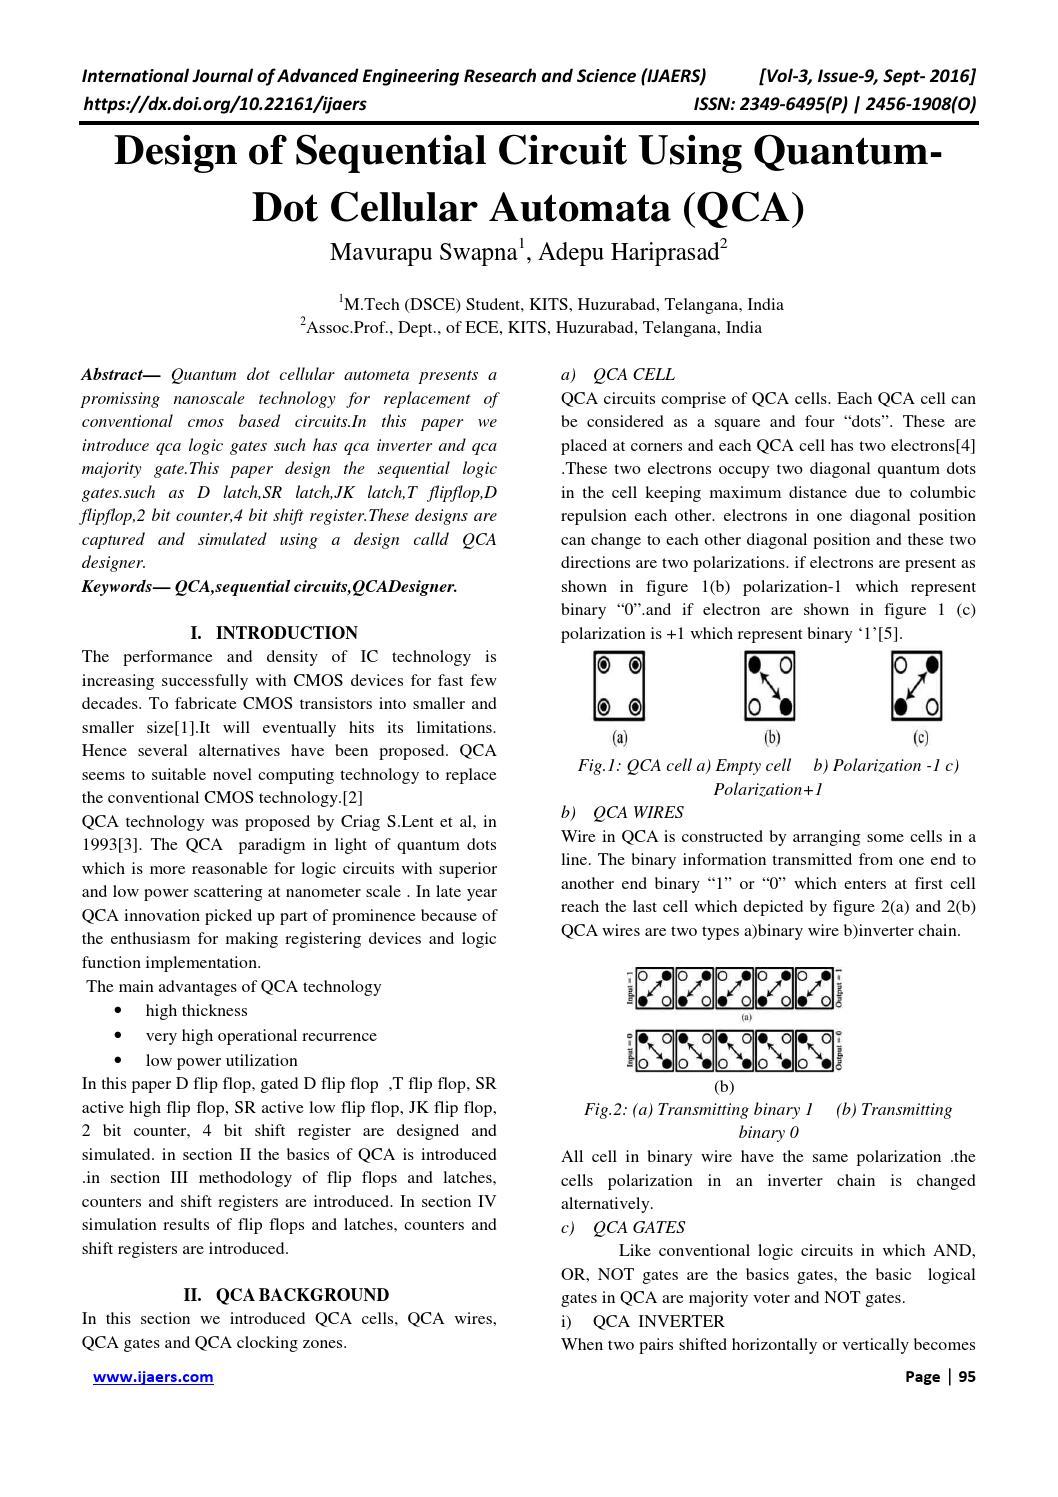 15 Design Of Sequential Circuit Using Quantum Dot Cellular Automata T Flip Flop Diagram Qca By Ijaers Journal Issuu